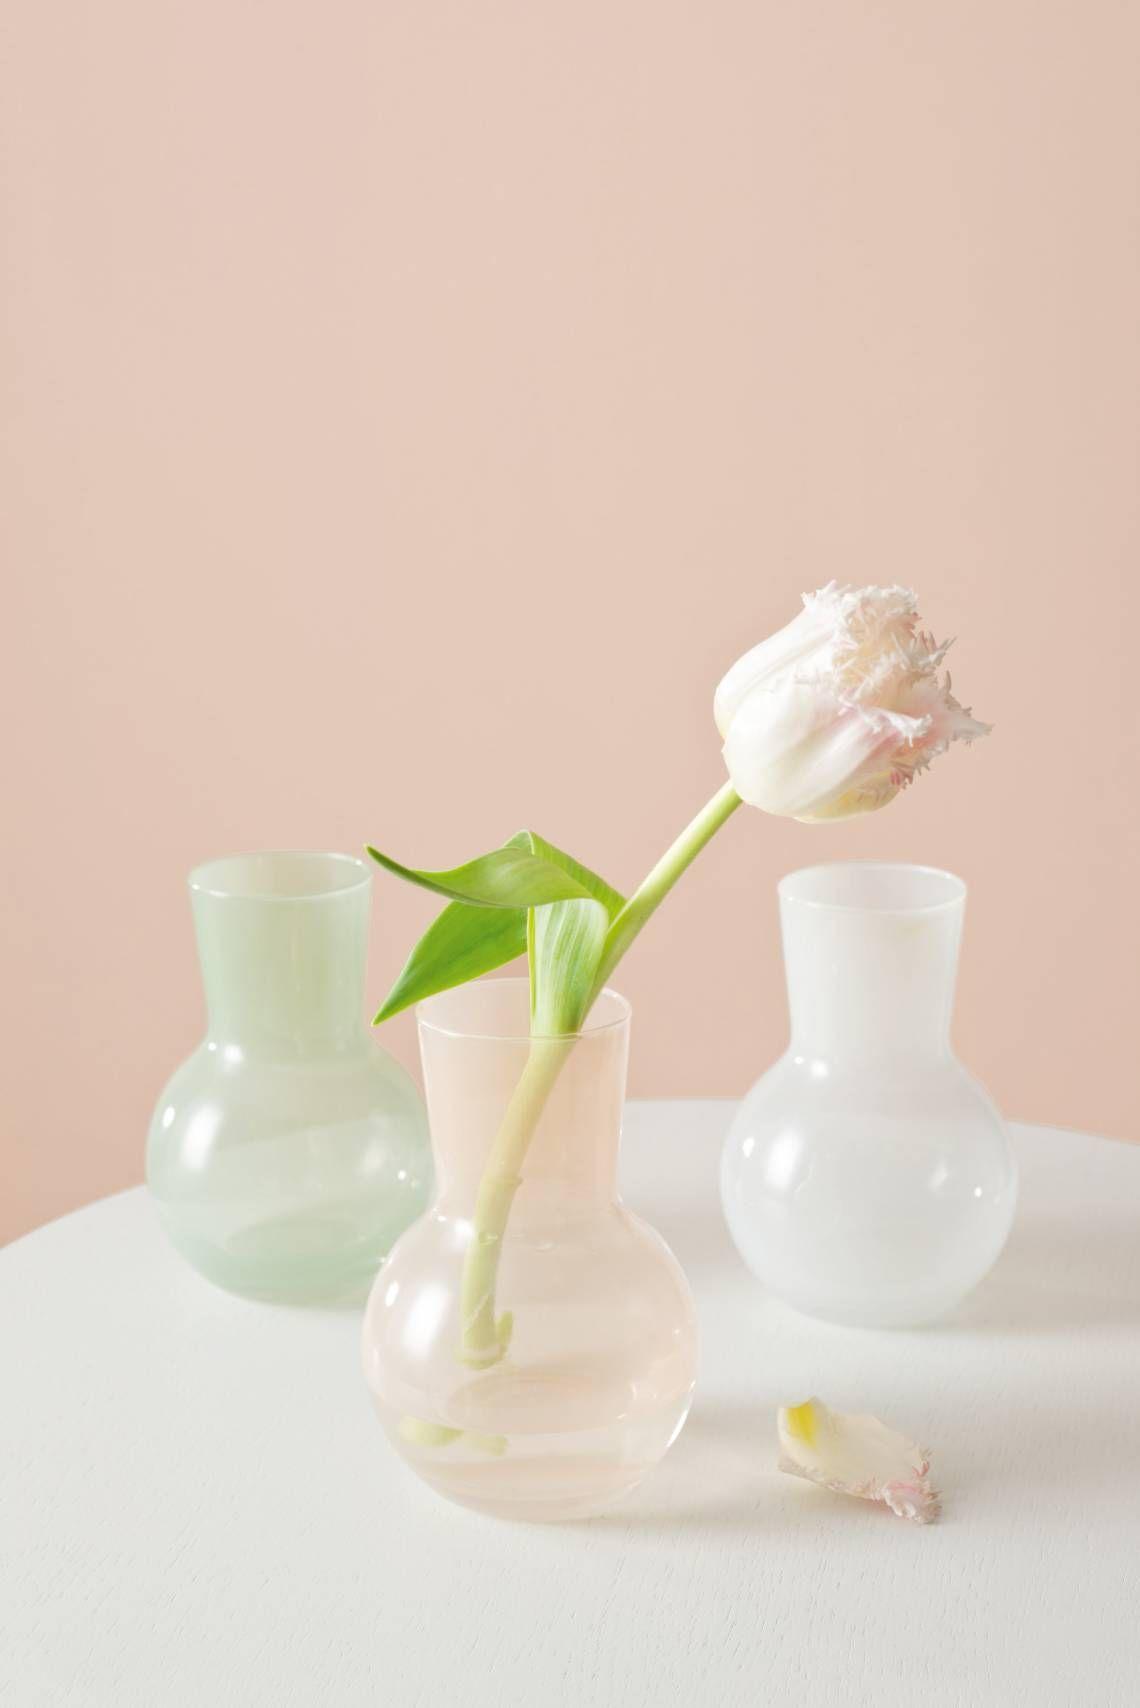 Leonardo Primavera Tischvasen Mood 2 Vase Glas Porzellan